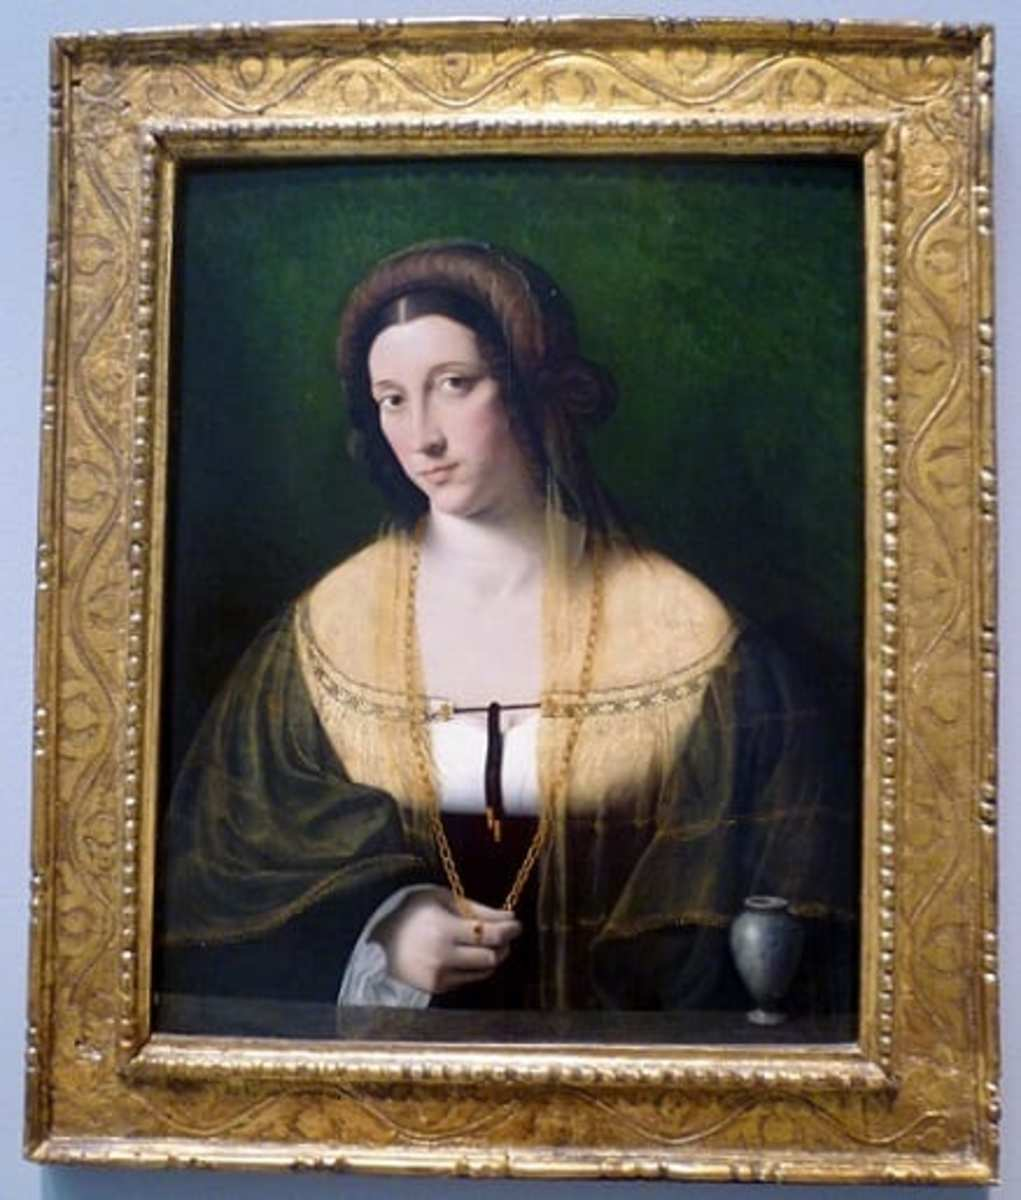 Portrait of a Woman by Bartolomeo Veneto